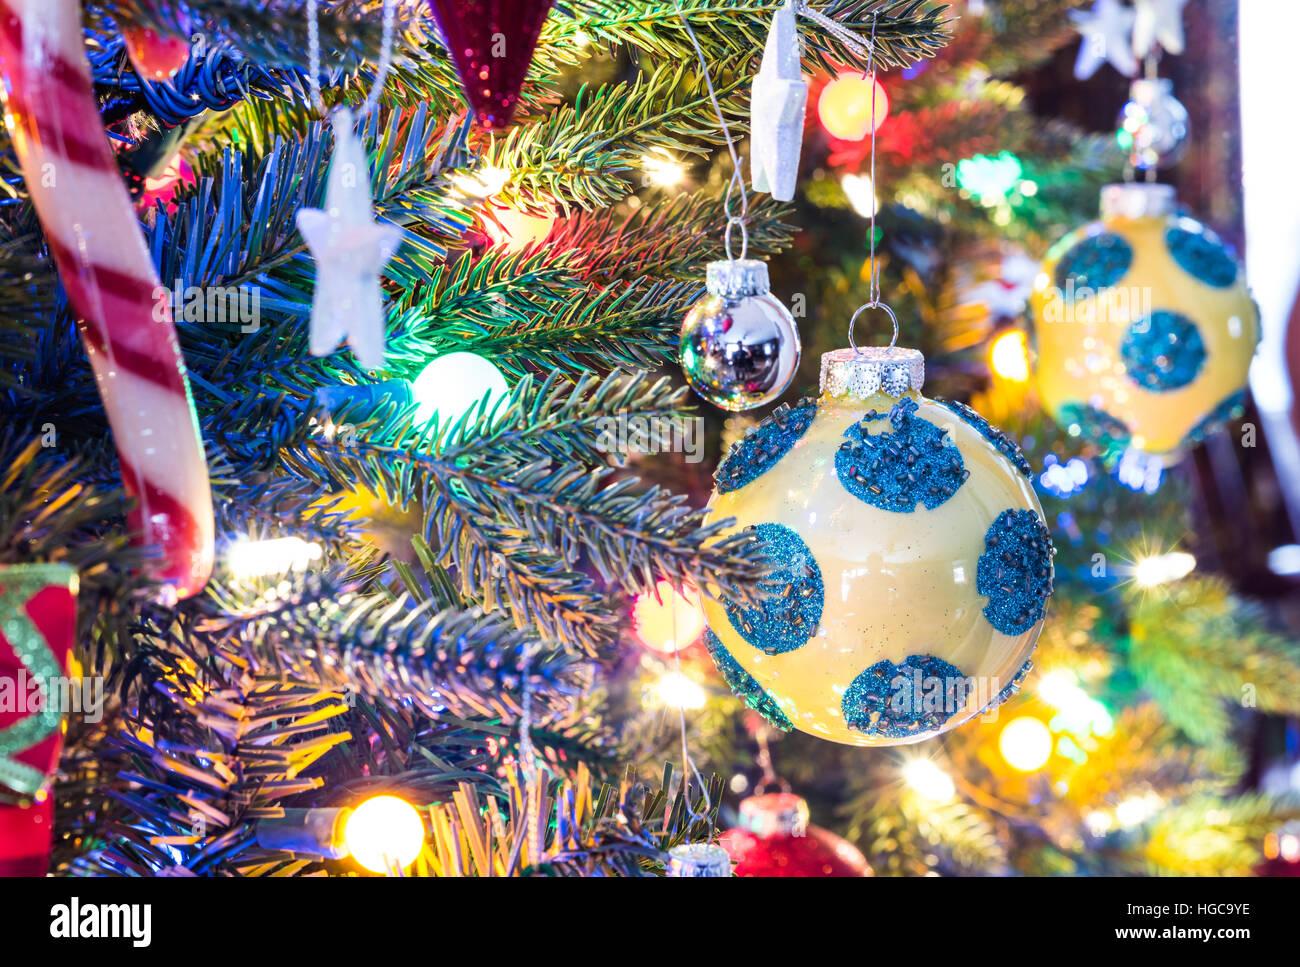 Christmas Tree Decorations Yellow Shiny Finish Orb With Blue Stock Photo Alamy